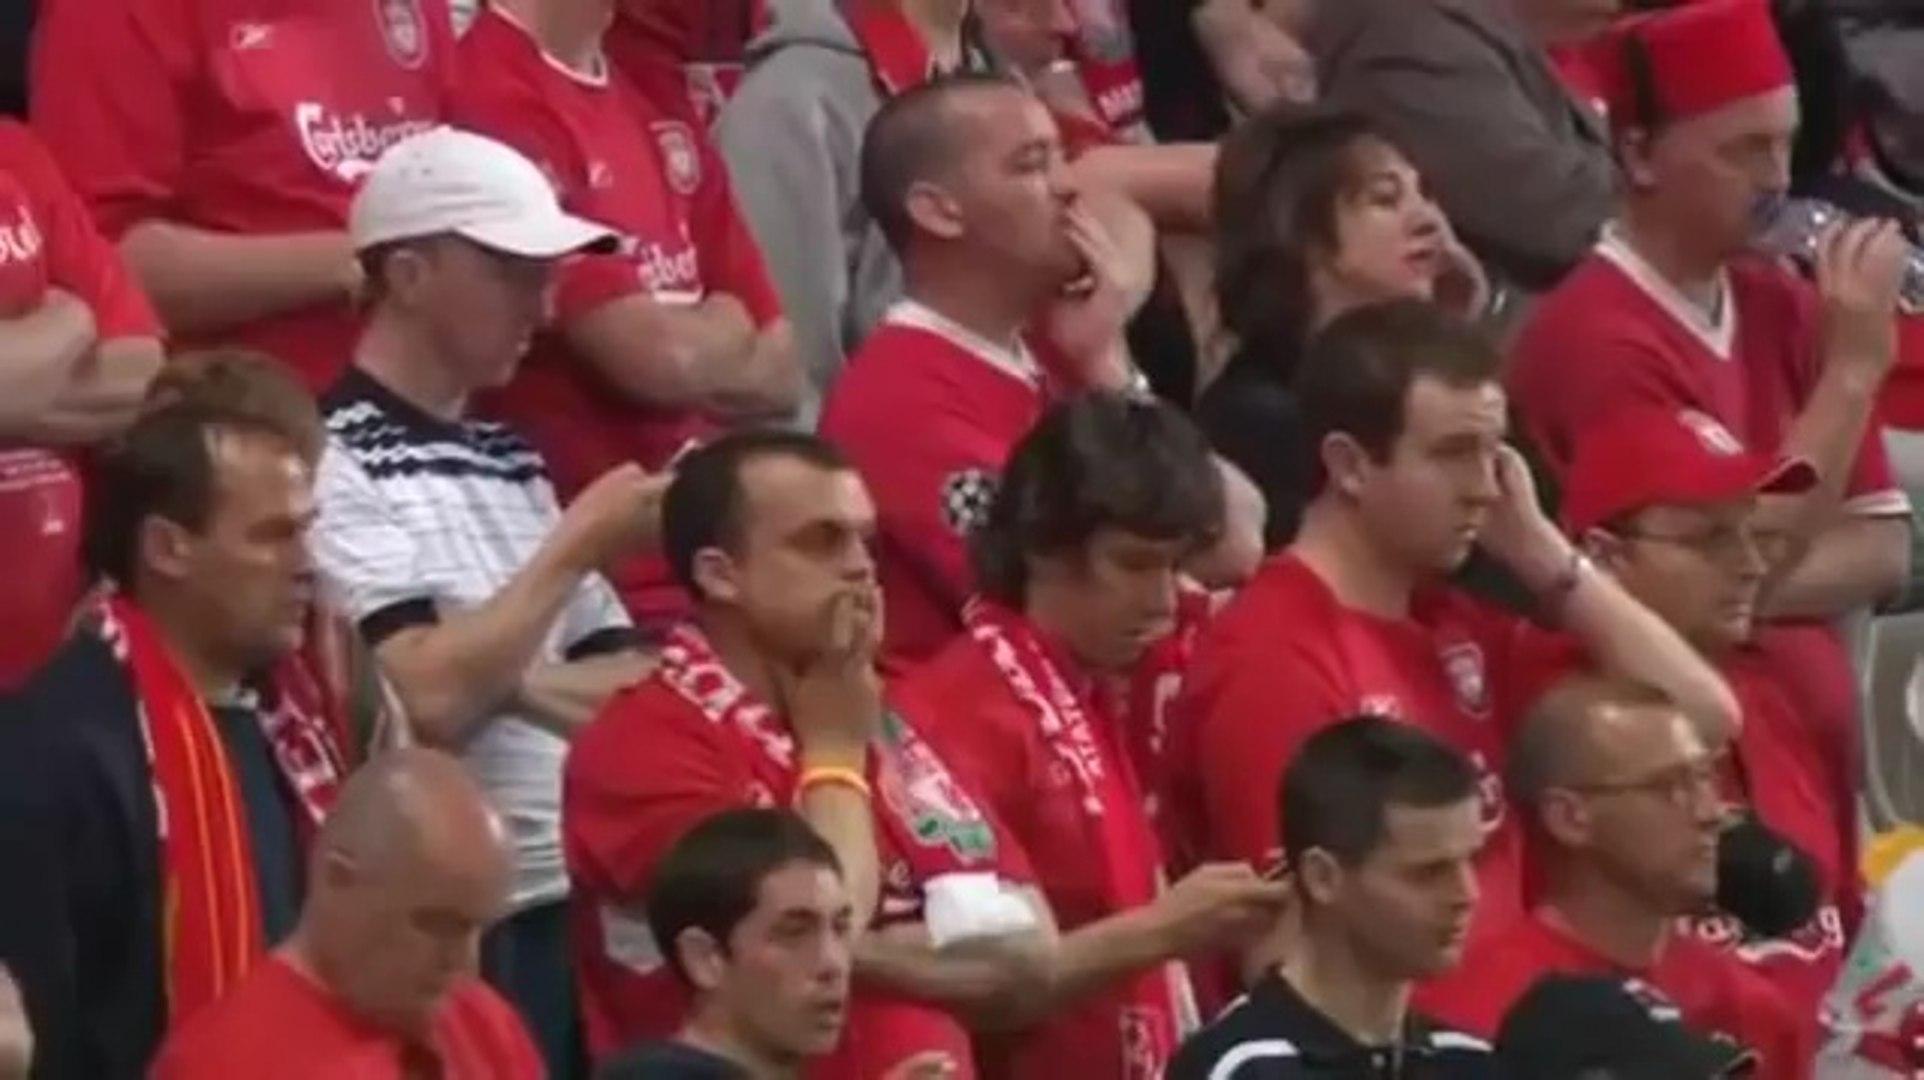 UEFA Champions League 2005 Final FC Liverpool vs AC Milan Full Match